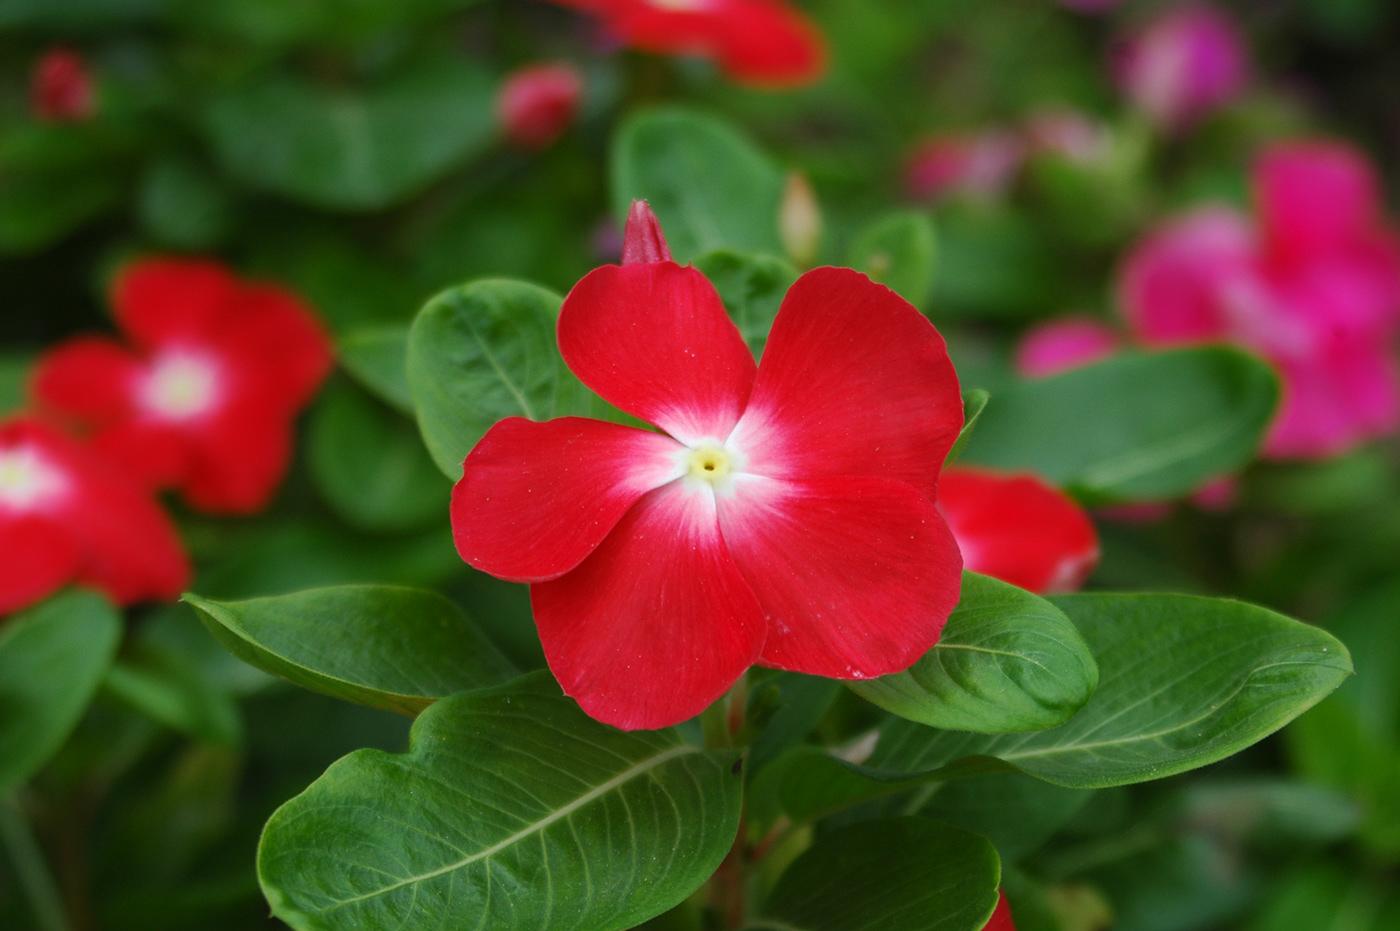 periwinkle flower Nature beauty macro Nikon photo Photography  lightroom photoshop